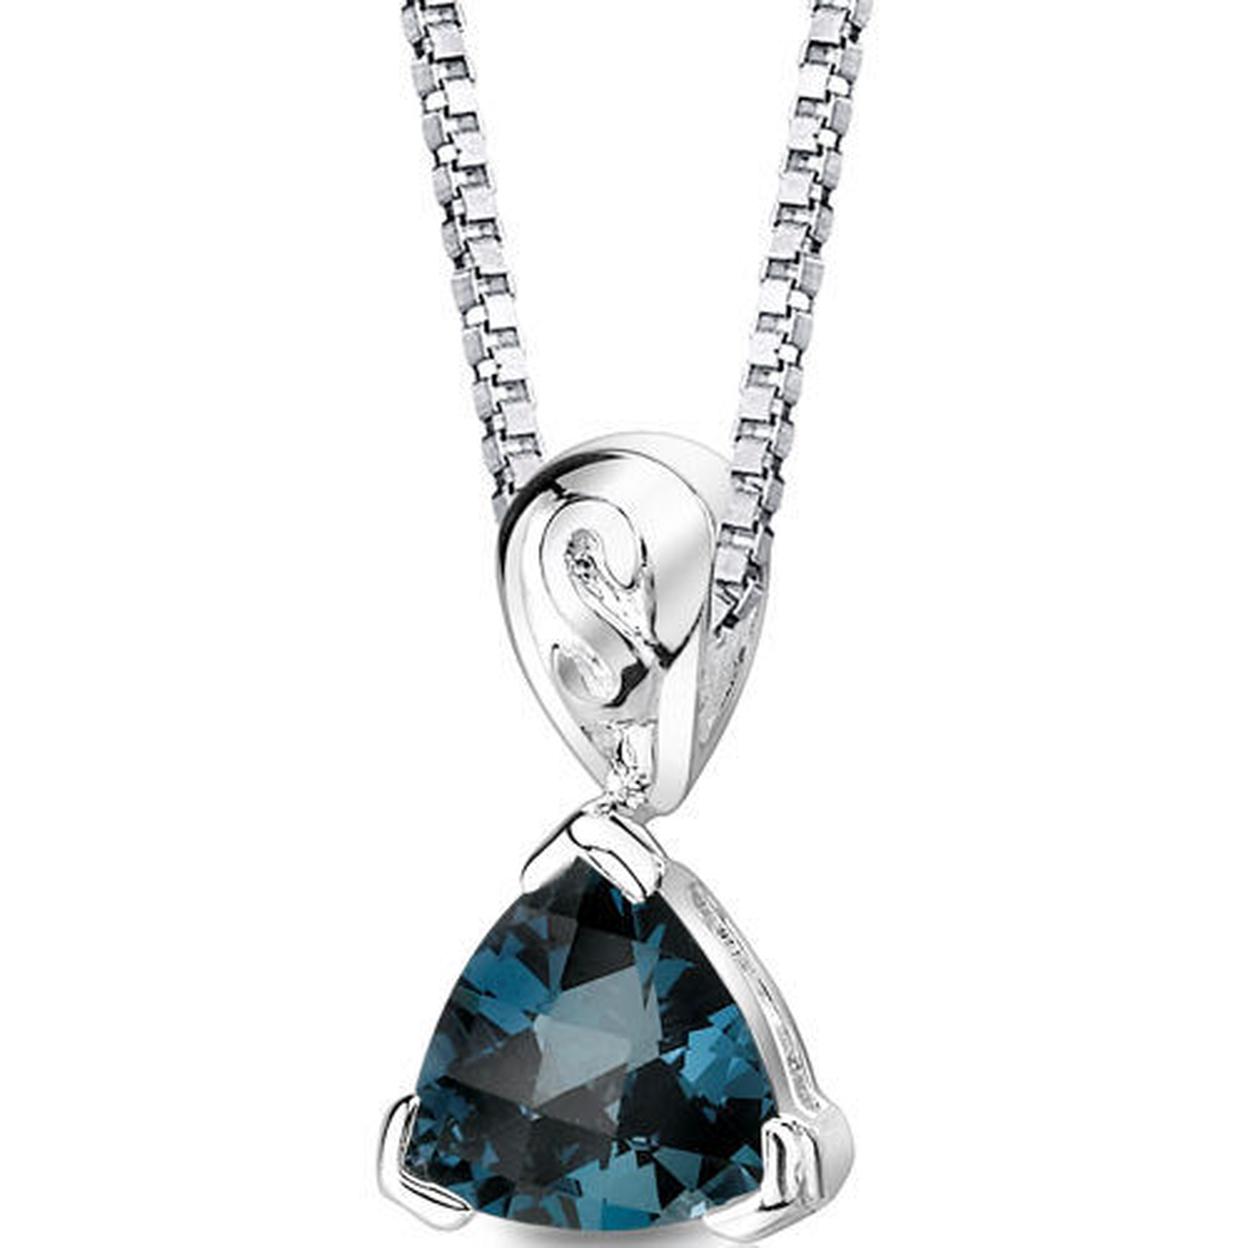 Sterling Silver 2.00 Carats Trillion London Blue Topaz Pendant Style Sp8596